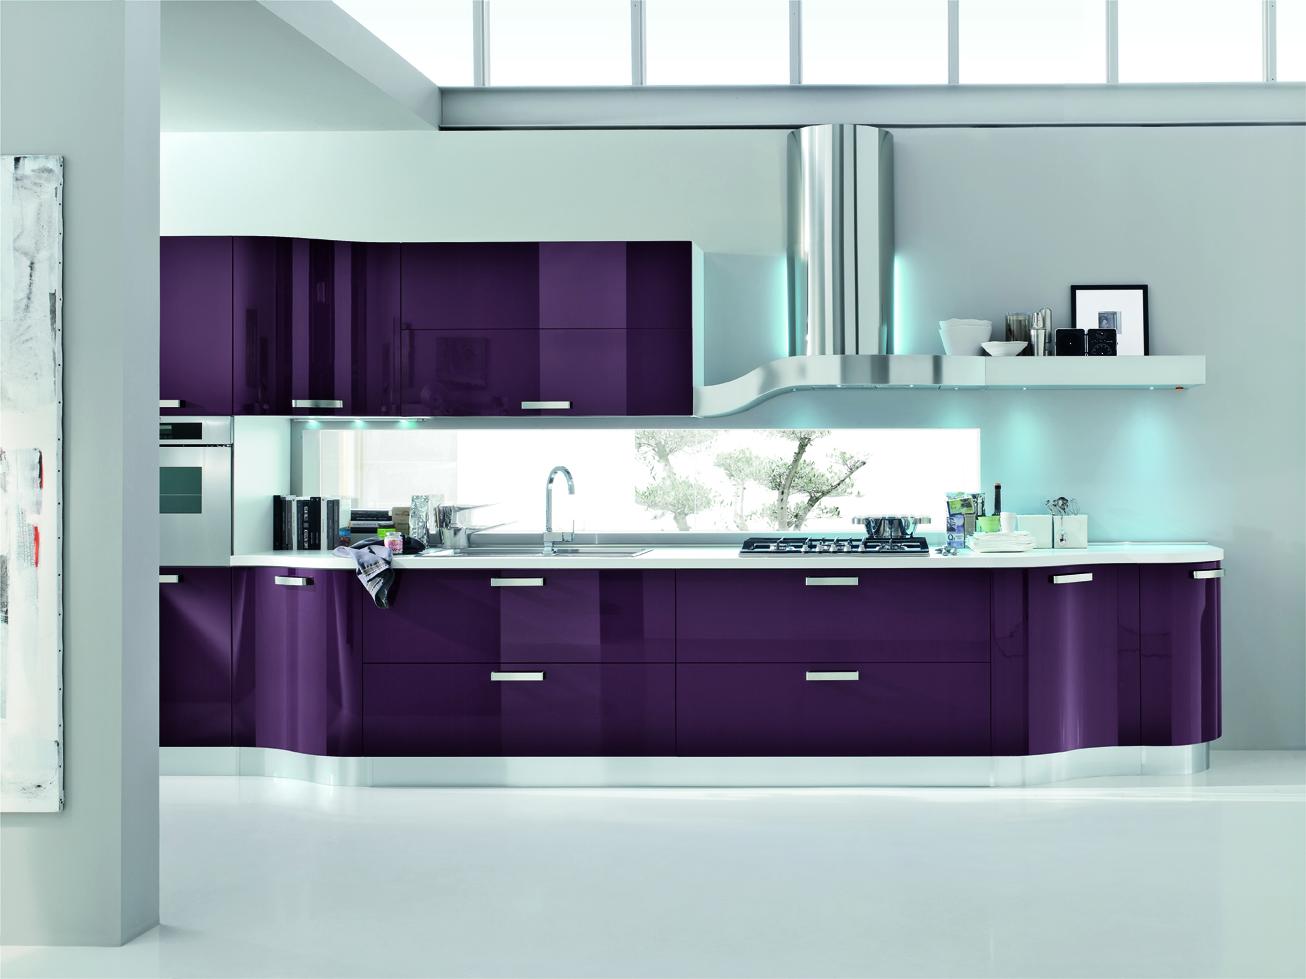 Foto cucina moderna kristal by gicinque arredamento for Arredamento cucina moderna foto